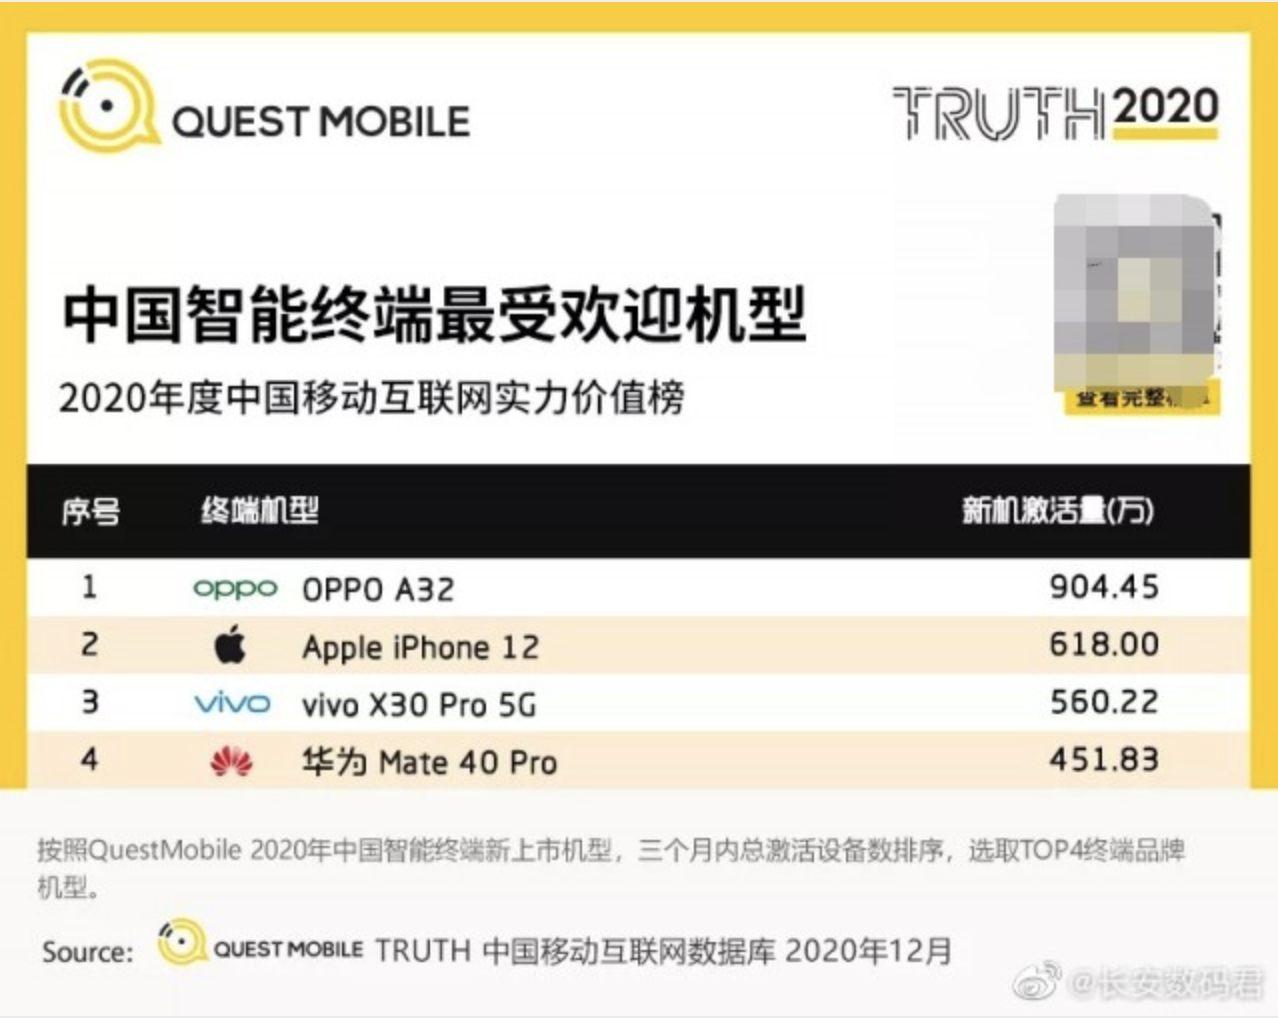 Smartphone terlaris 4 teratas di China untuk Q4 2020 (Doc: Quest Mobile)